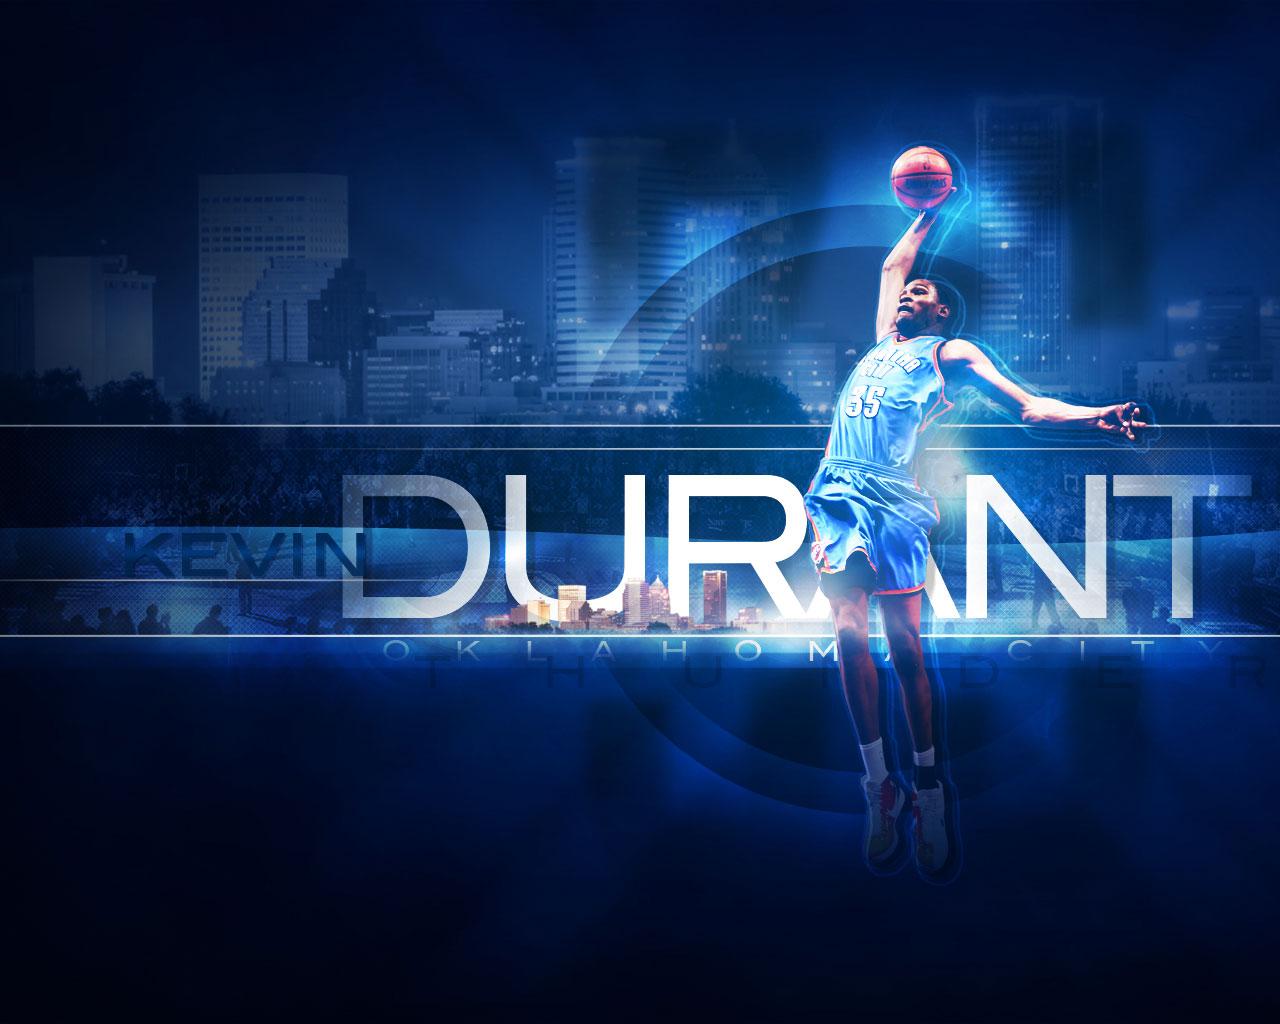 basketball wallpaper basketball background 30 kevin durant thunder 1280x1024